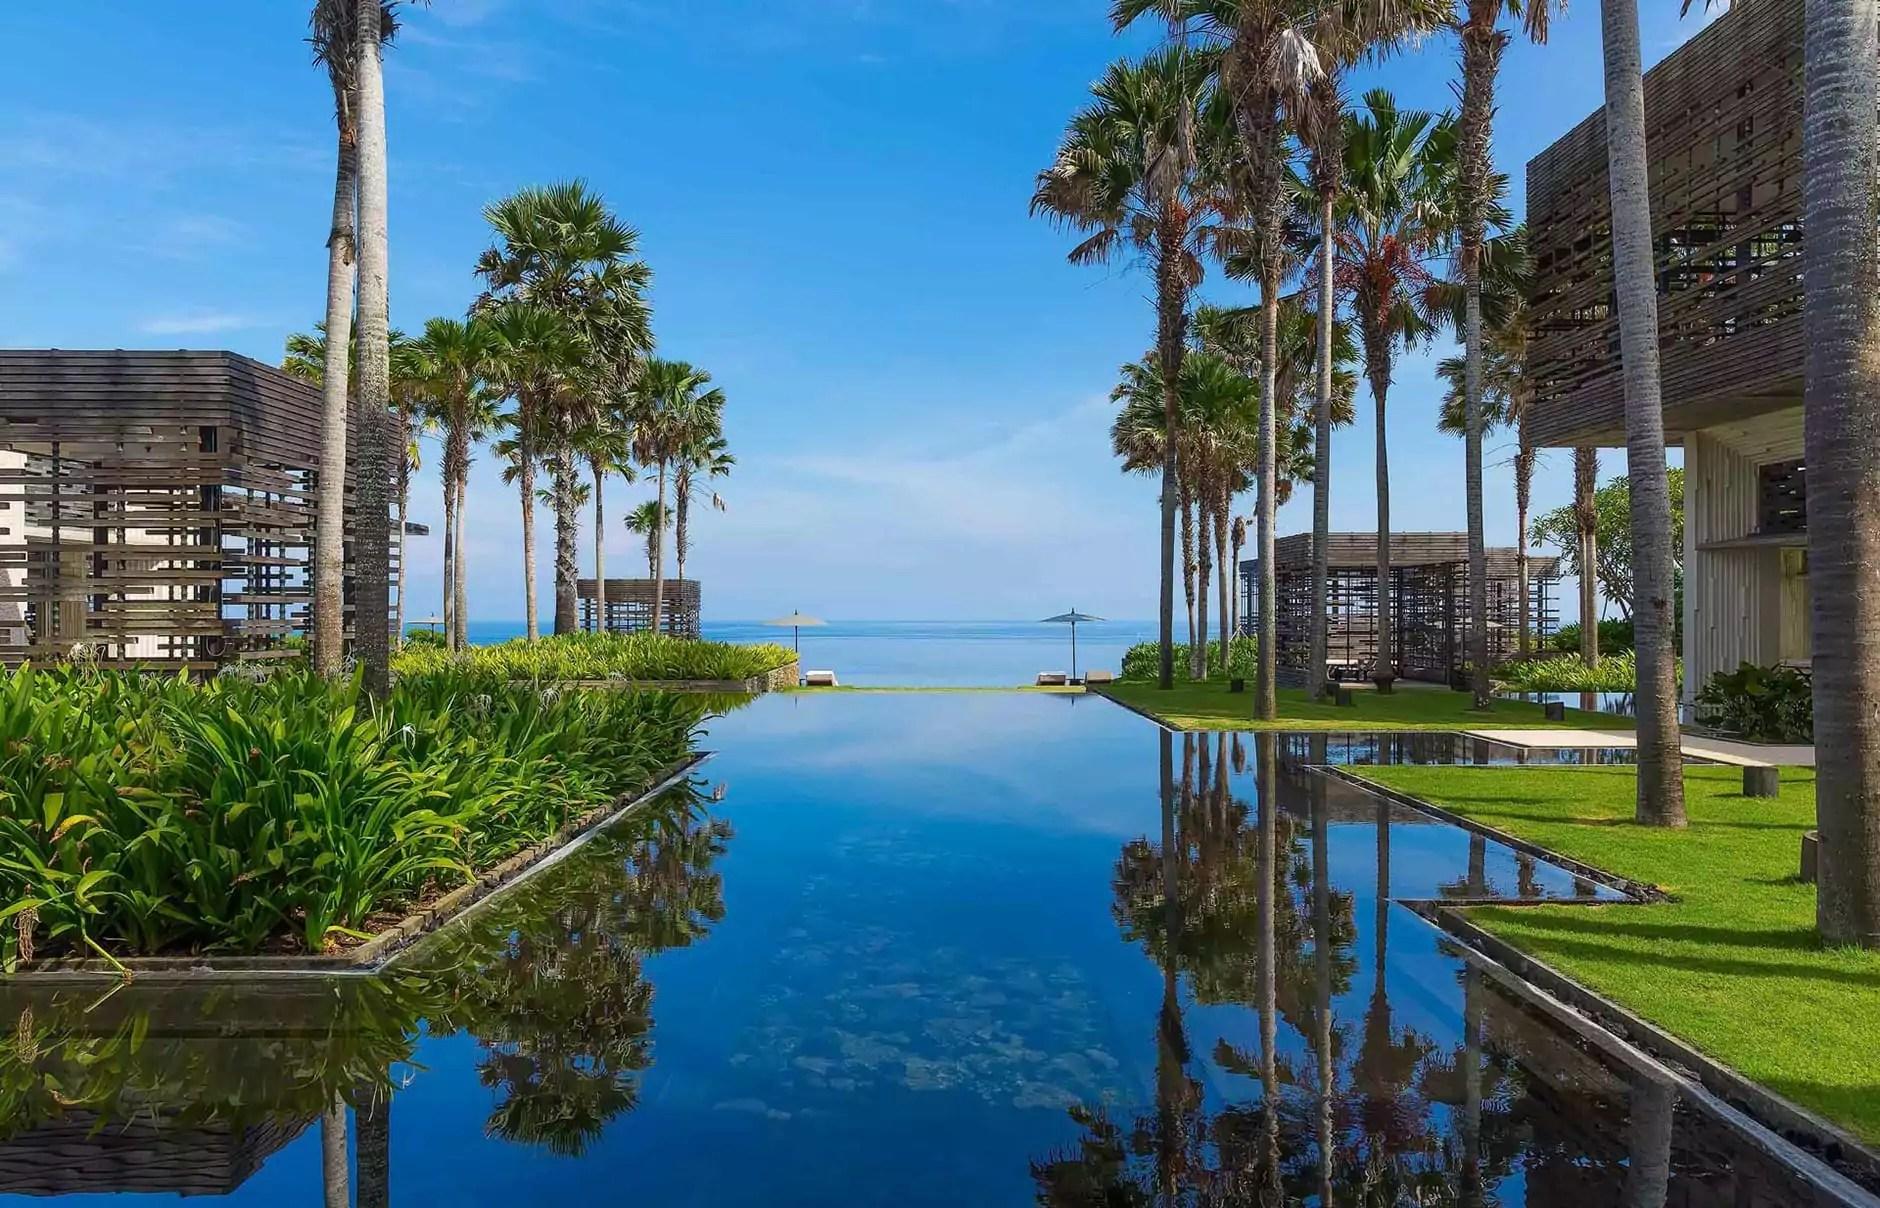 Alila Villas Uluwatu. luxury resort in Bali • Hotel review by TravelPlusStyle